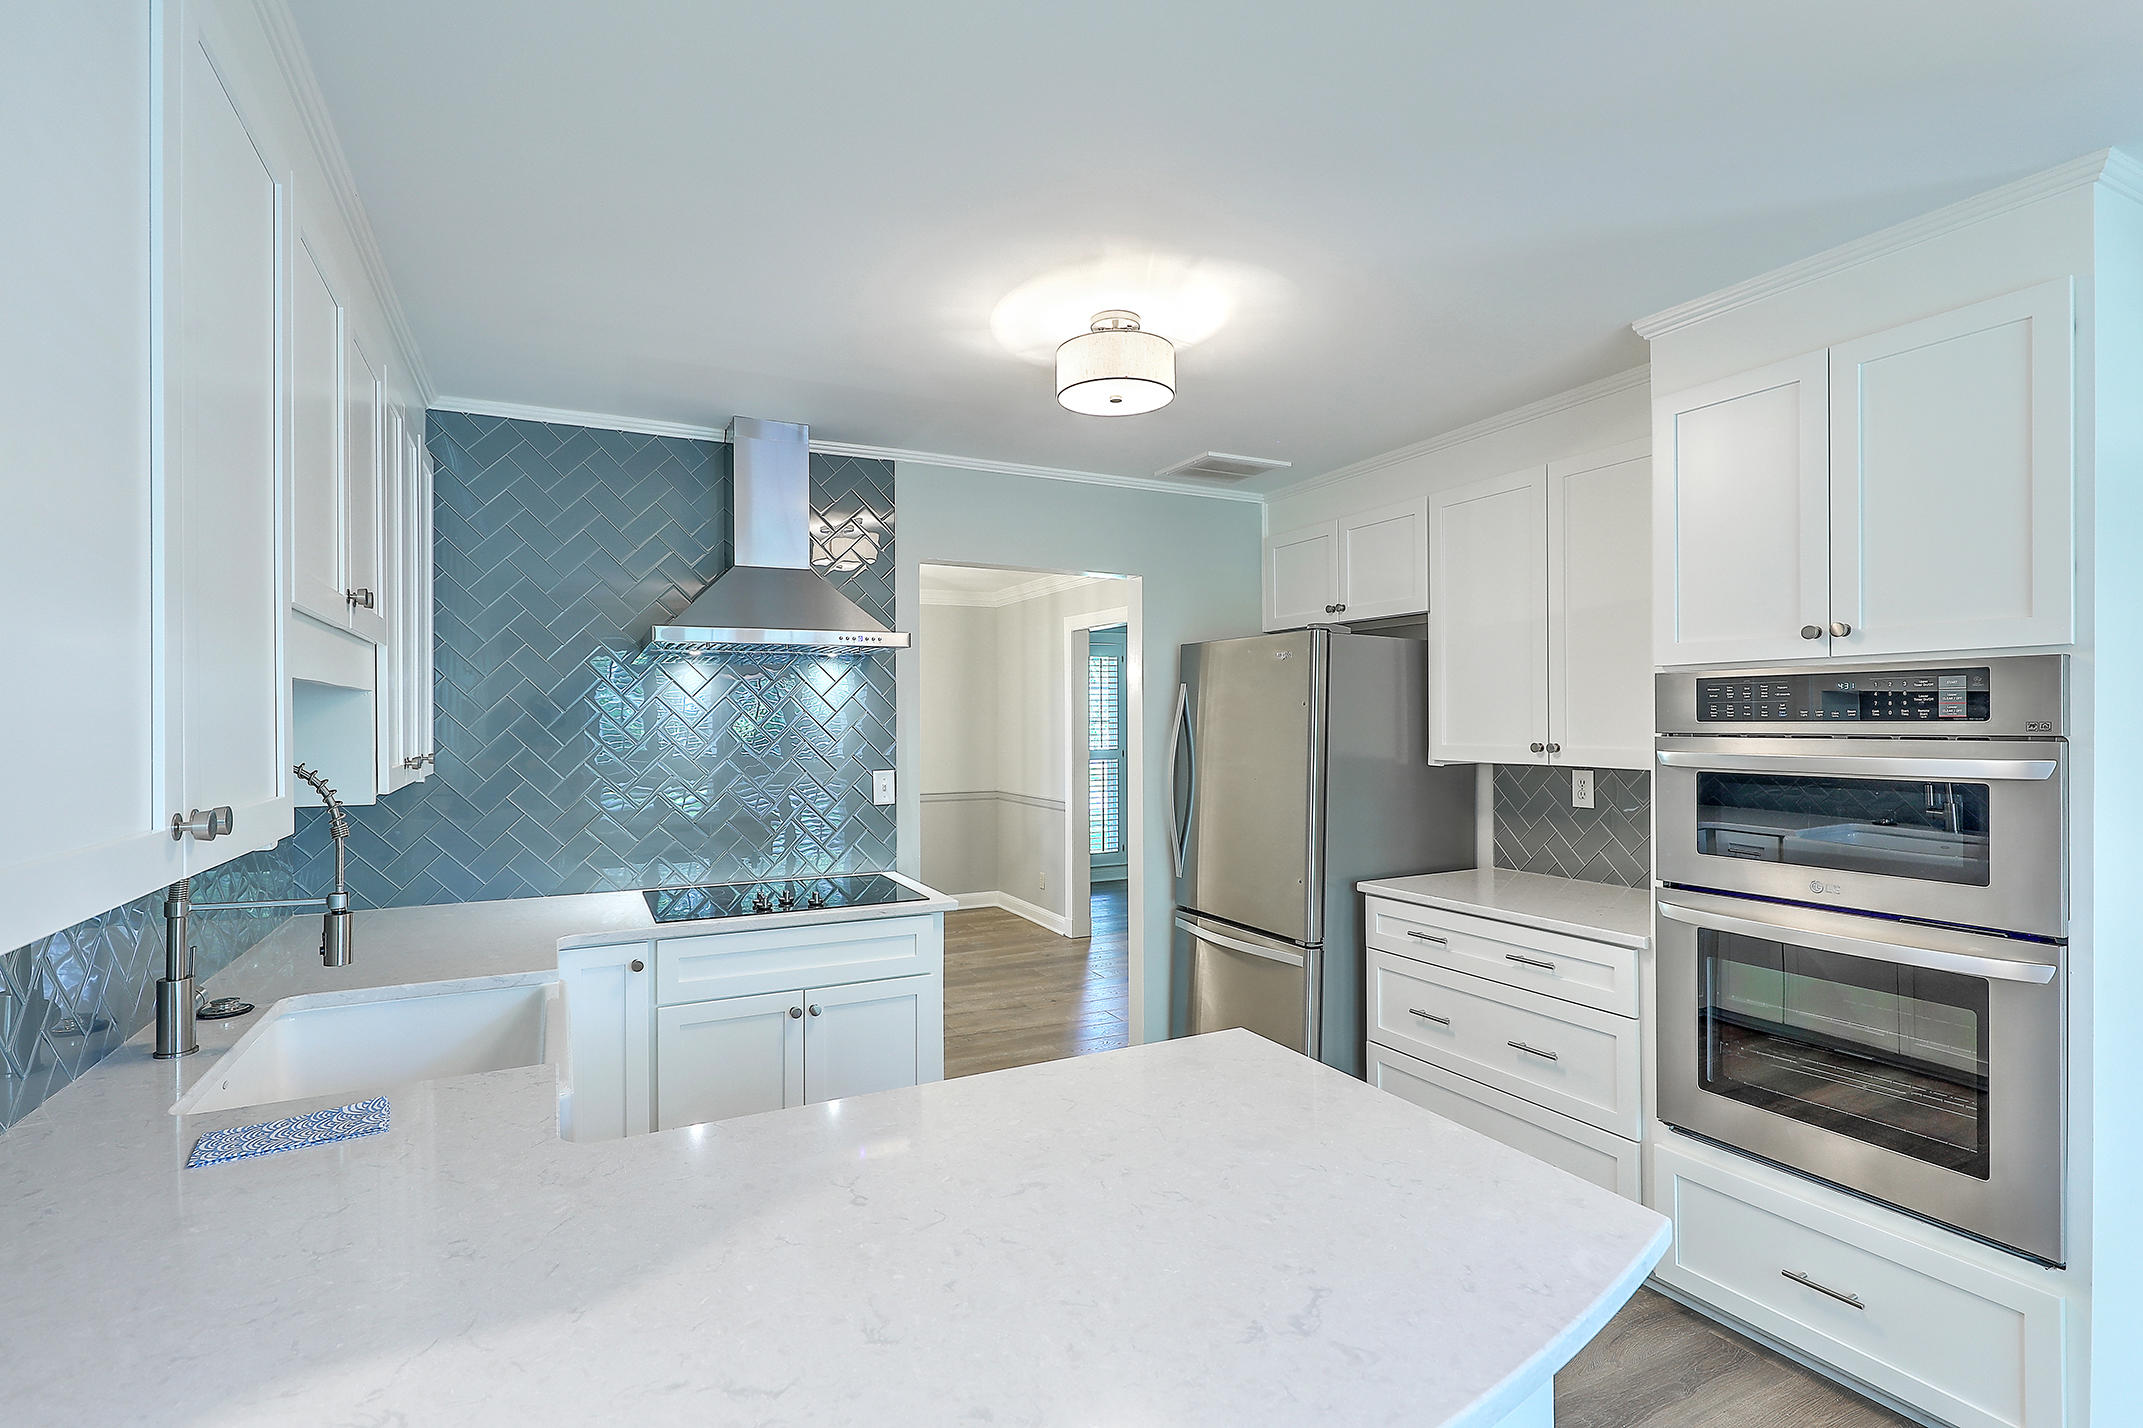 Wespanee Place Homes For Sale - 4 Ashland, Charleston, SC - 0